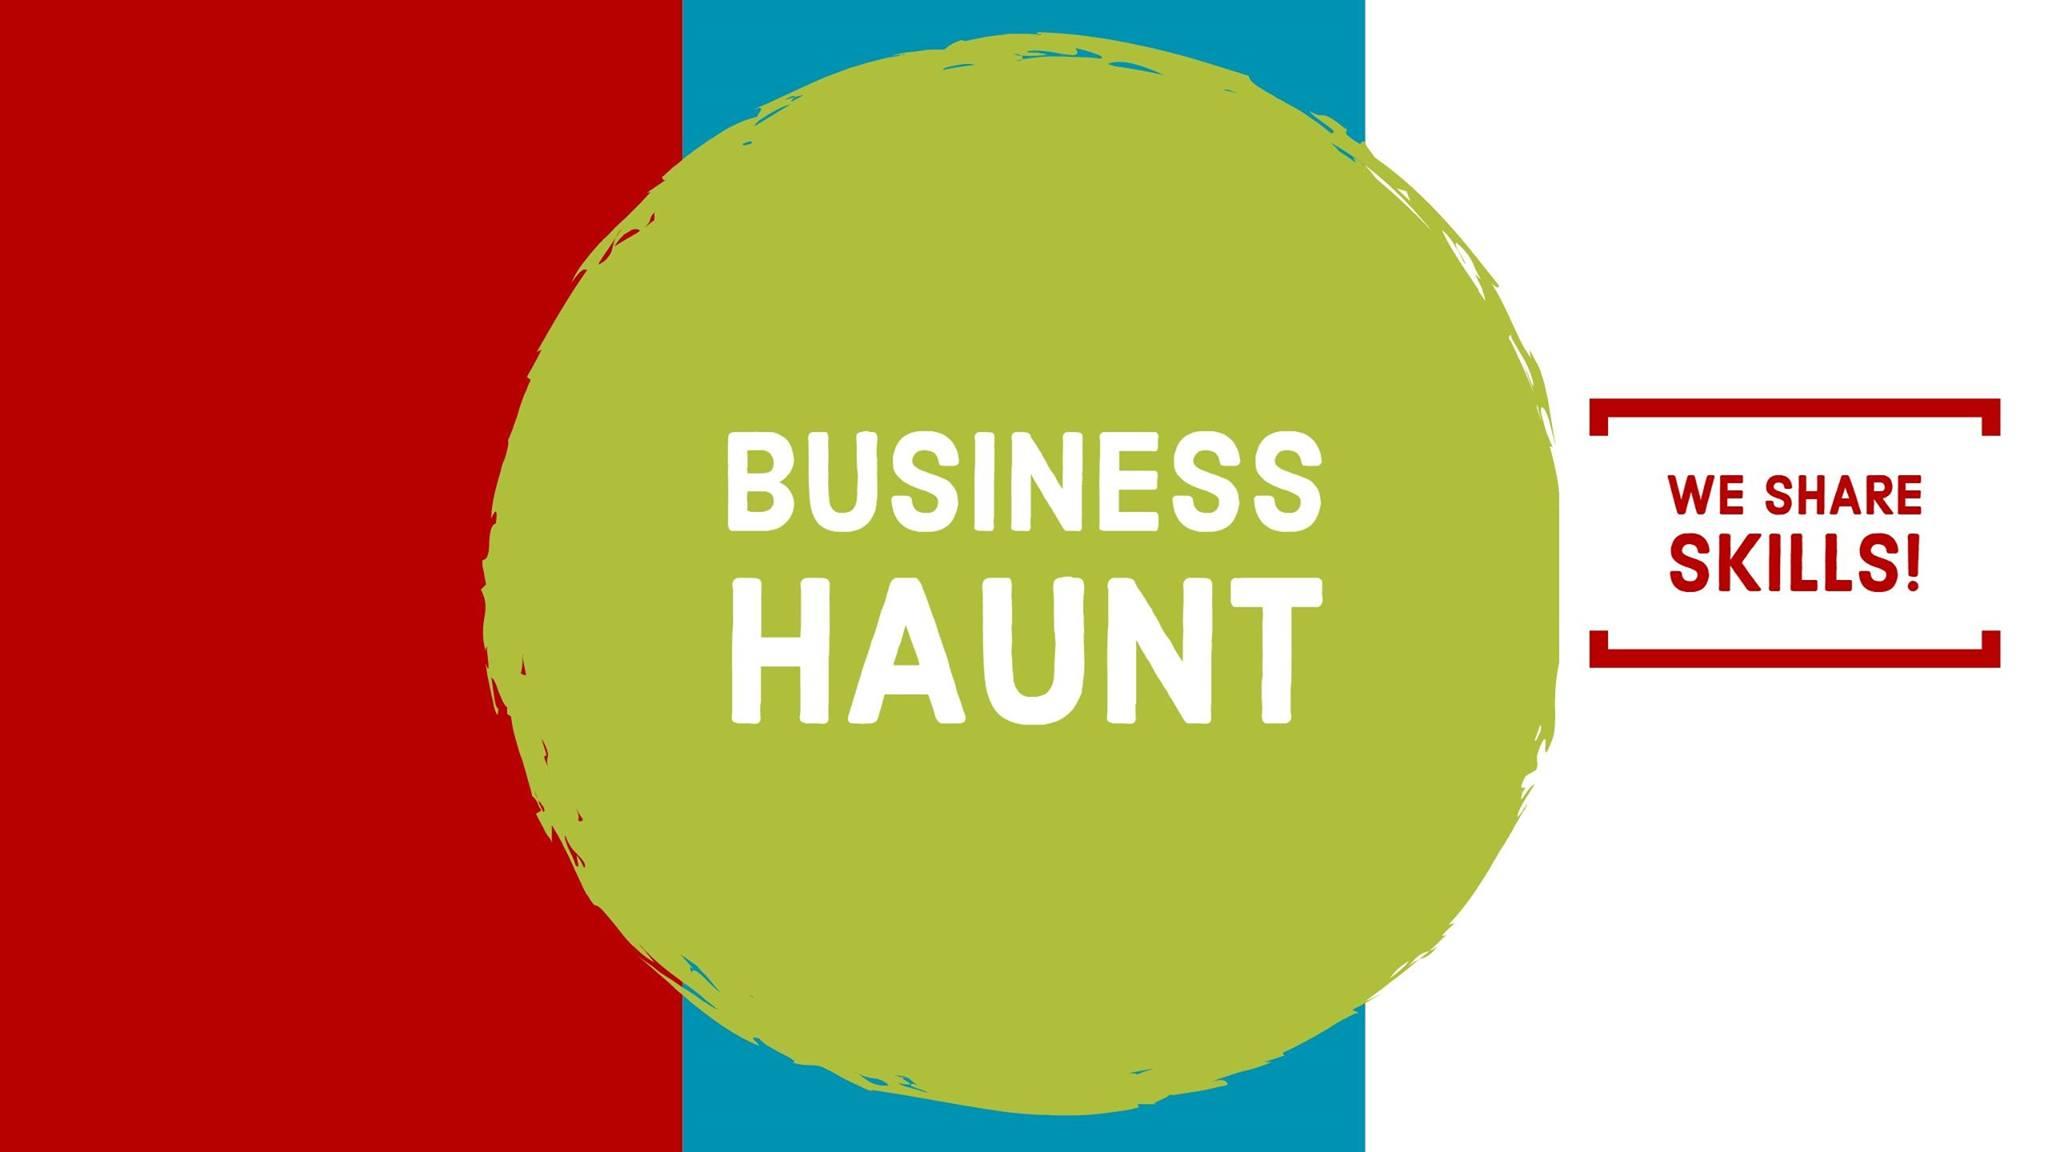 www.businesshaunt.com